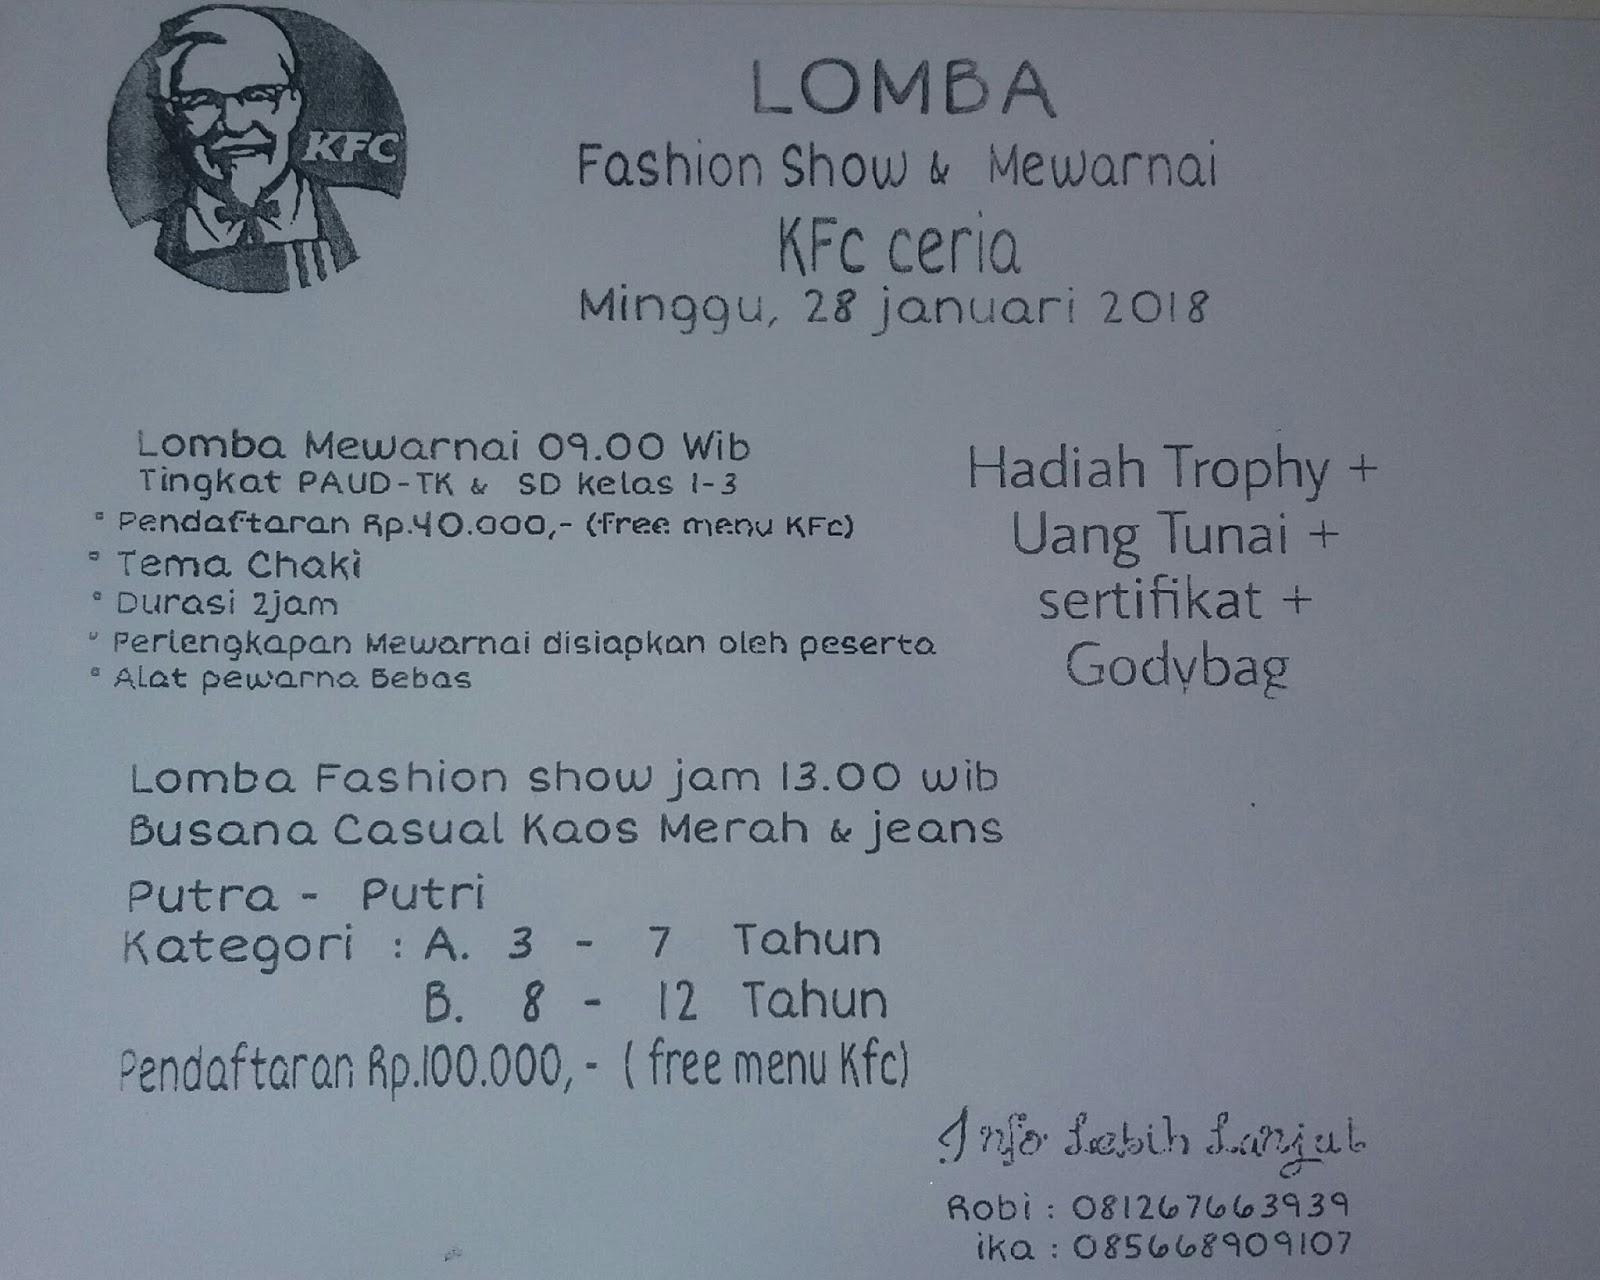 Blog Pasrah Setiawan Hia Lomba Mewarnai Dan Fashion Show Di Kfc